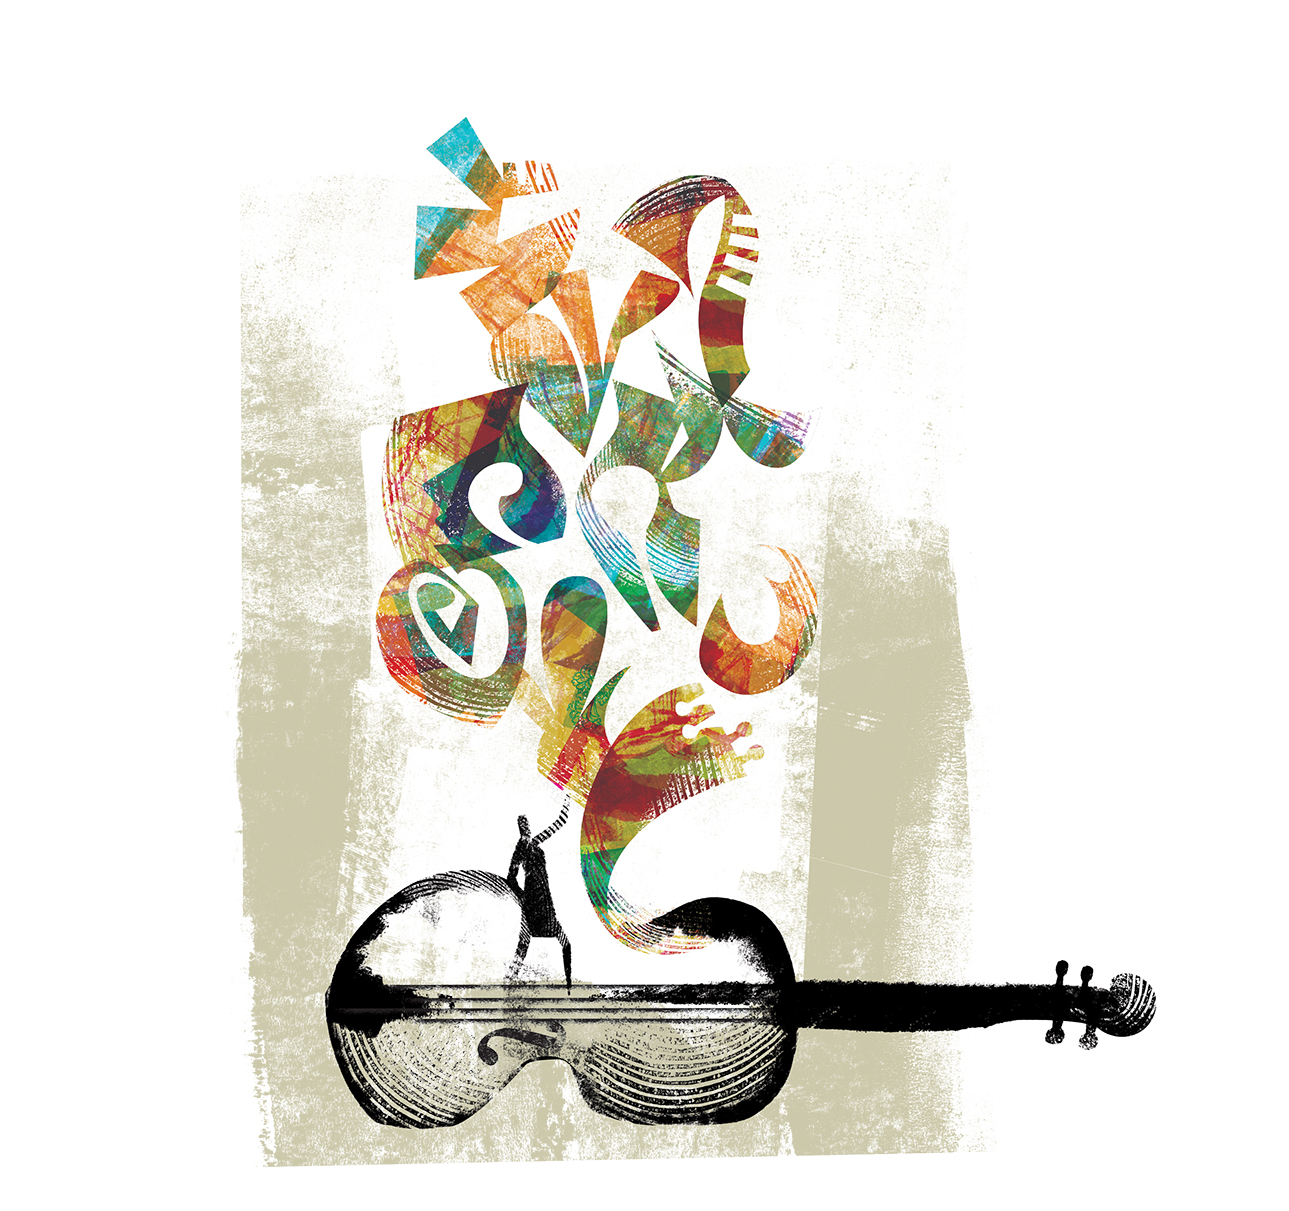 In tandem illustration